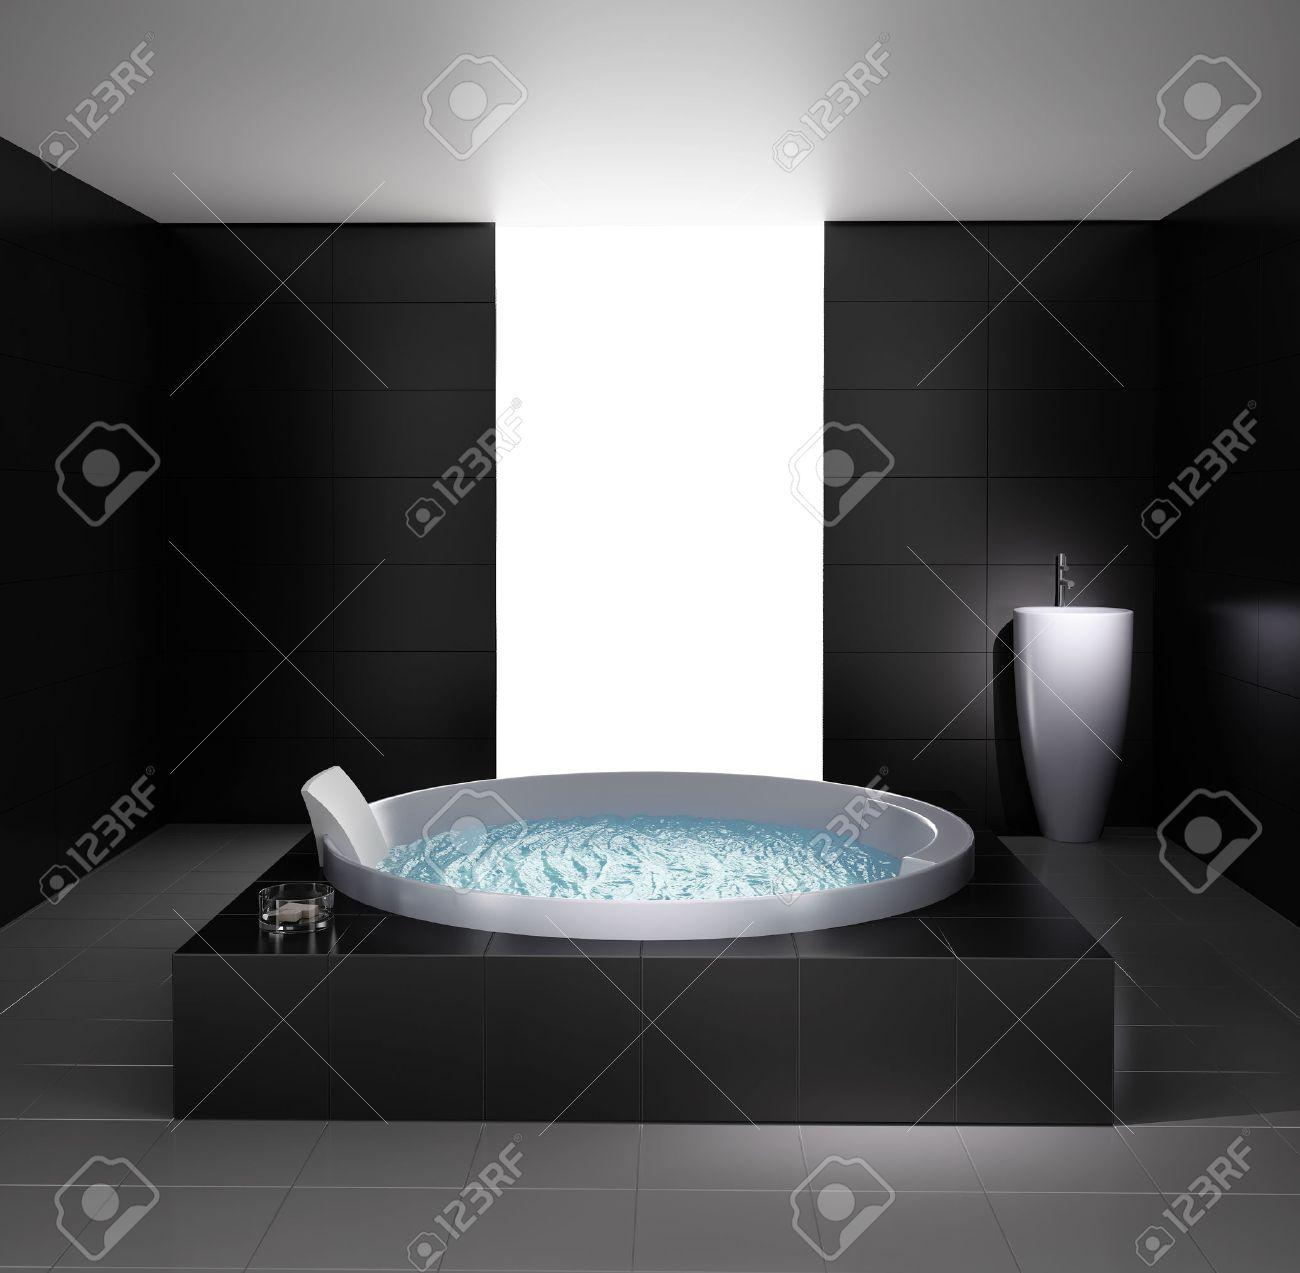 Minimal Black White Bathroom With Jacuzzi Bathtub Stock Photo